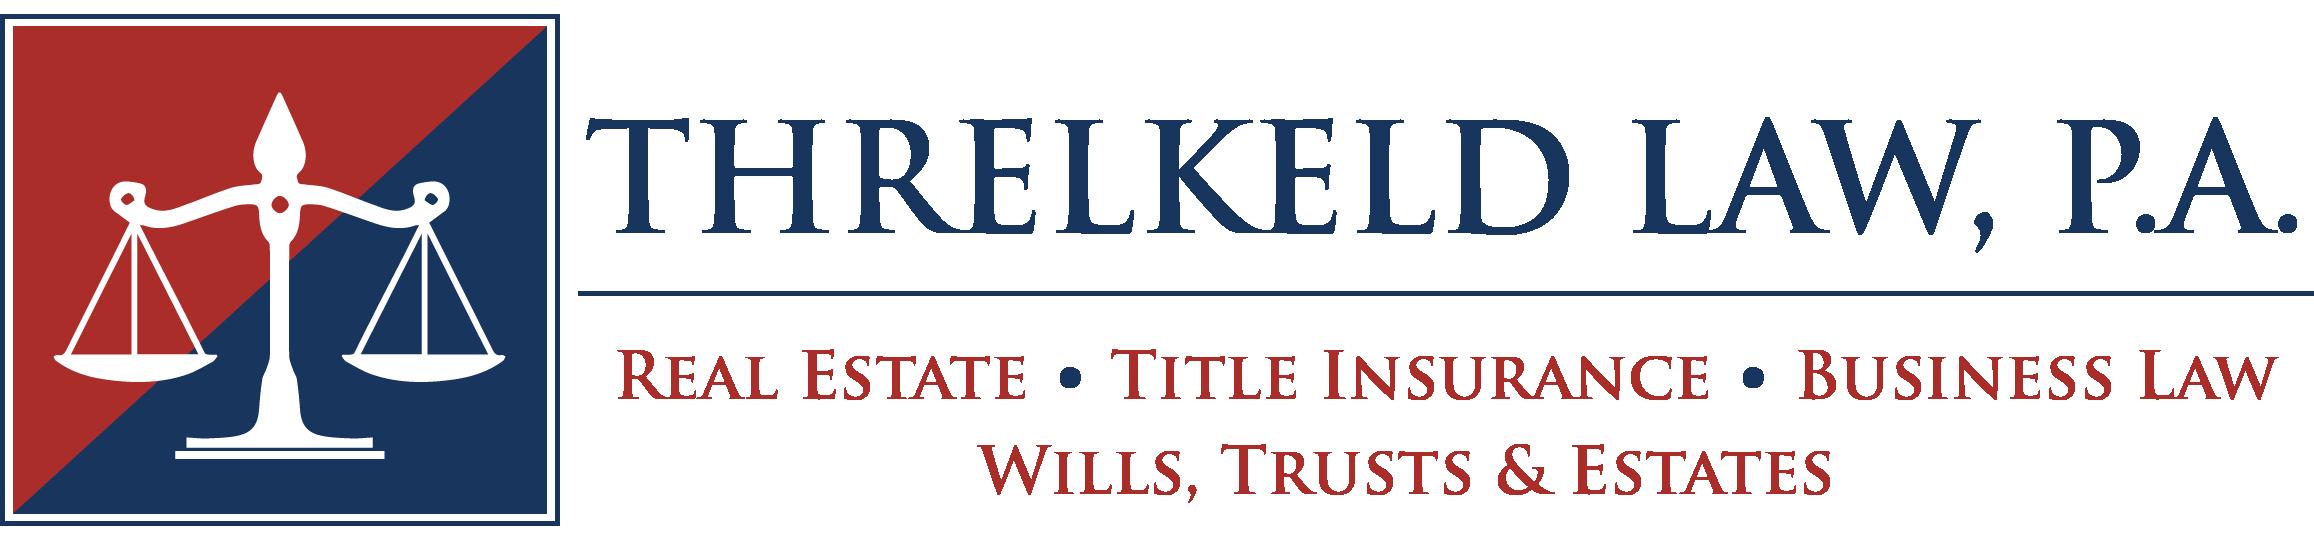 Threlkeld Law, PA Home